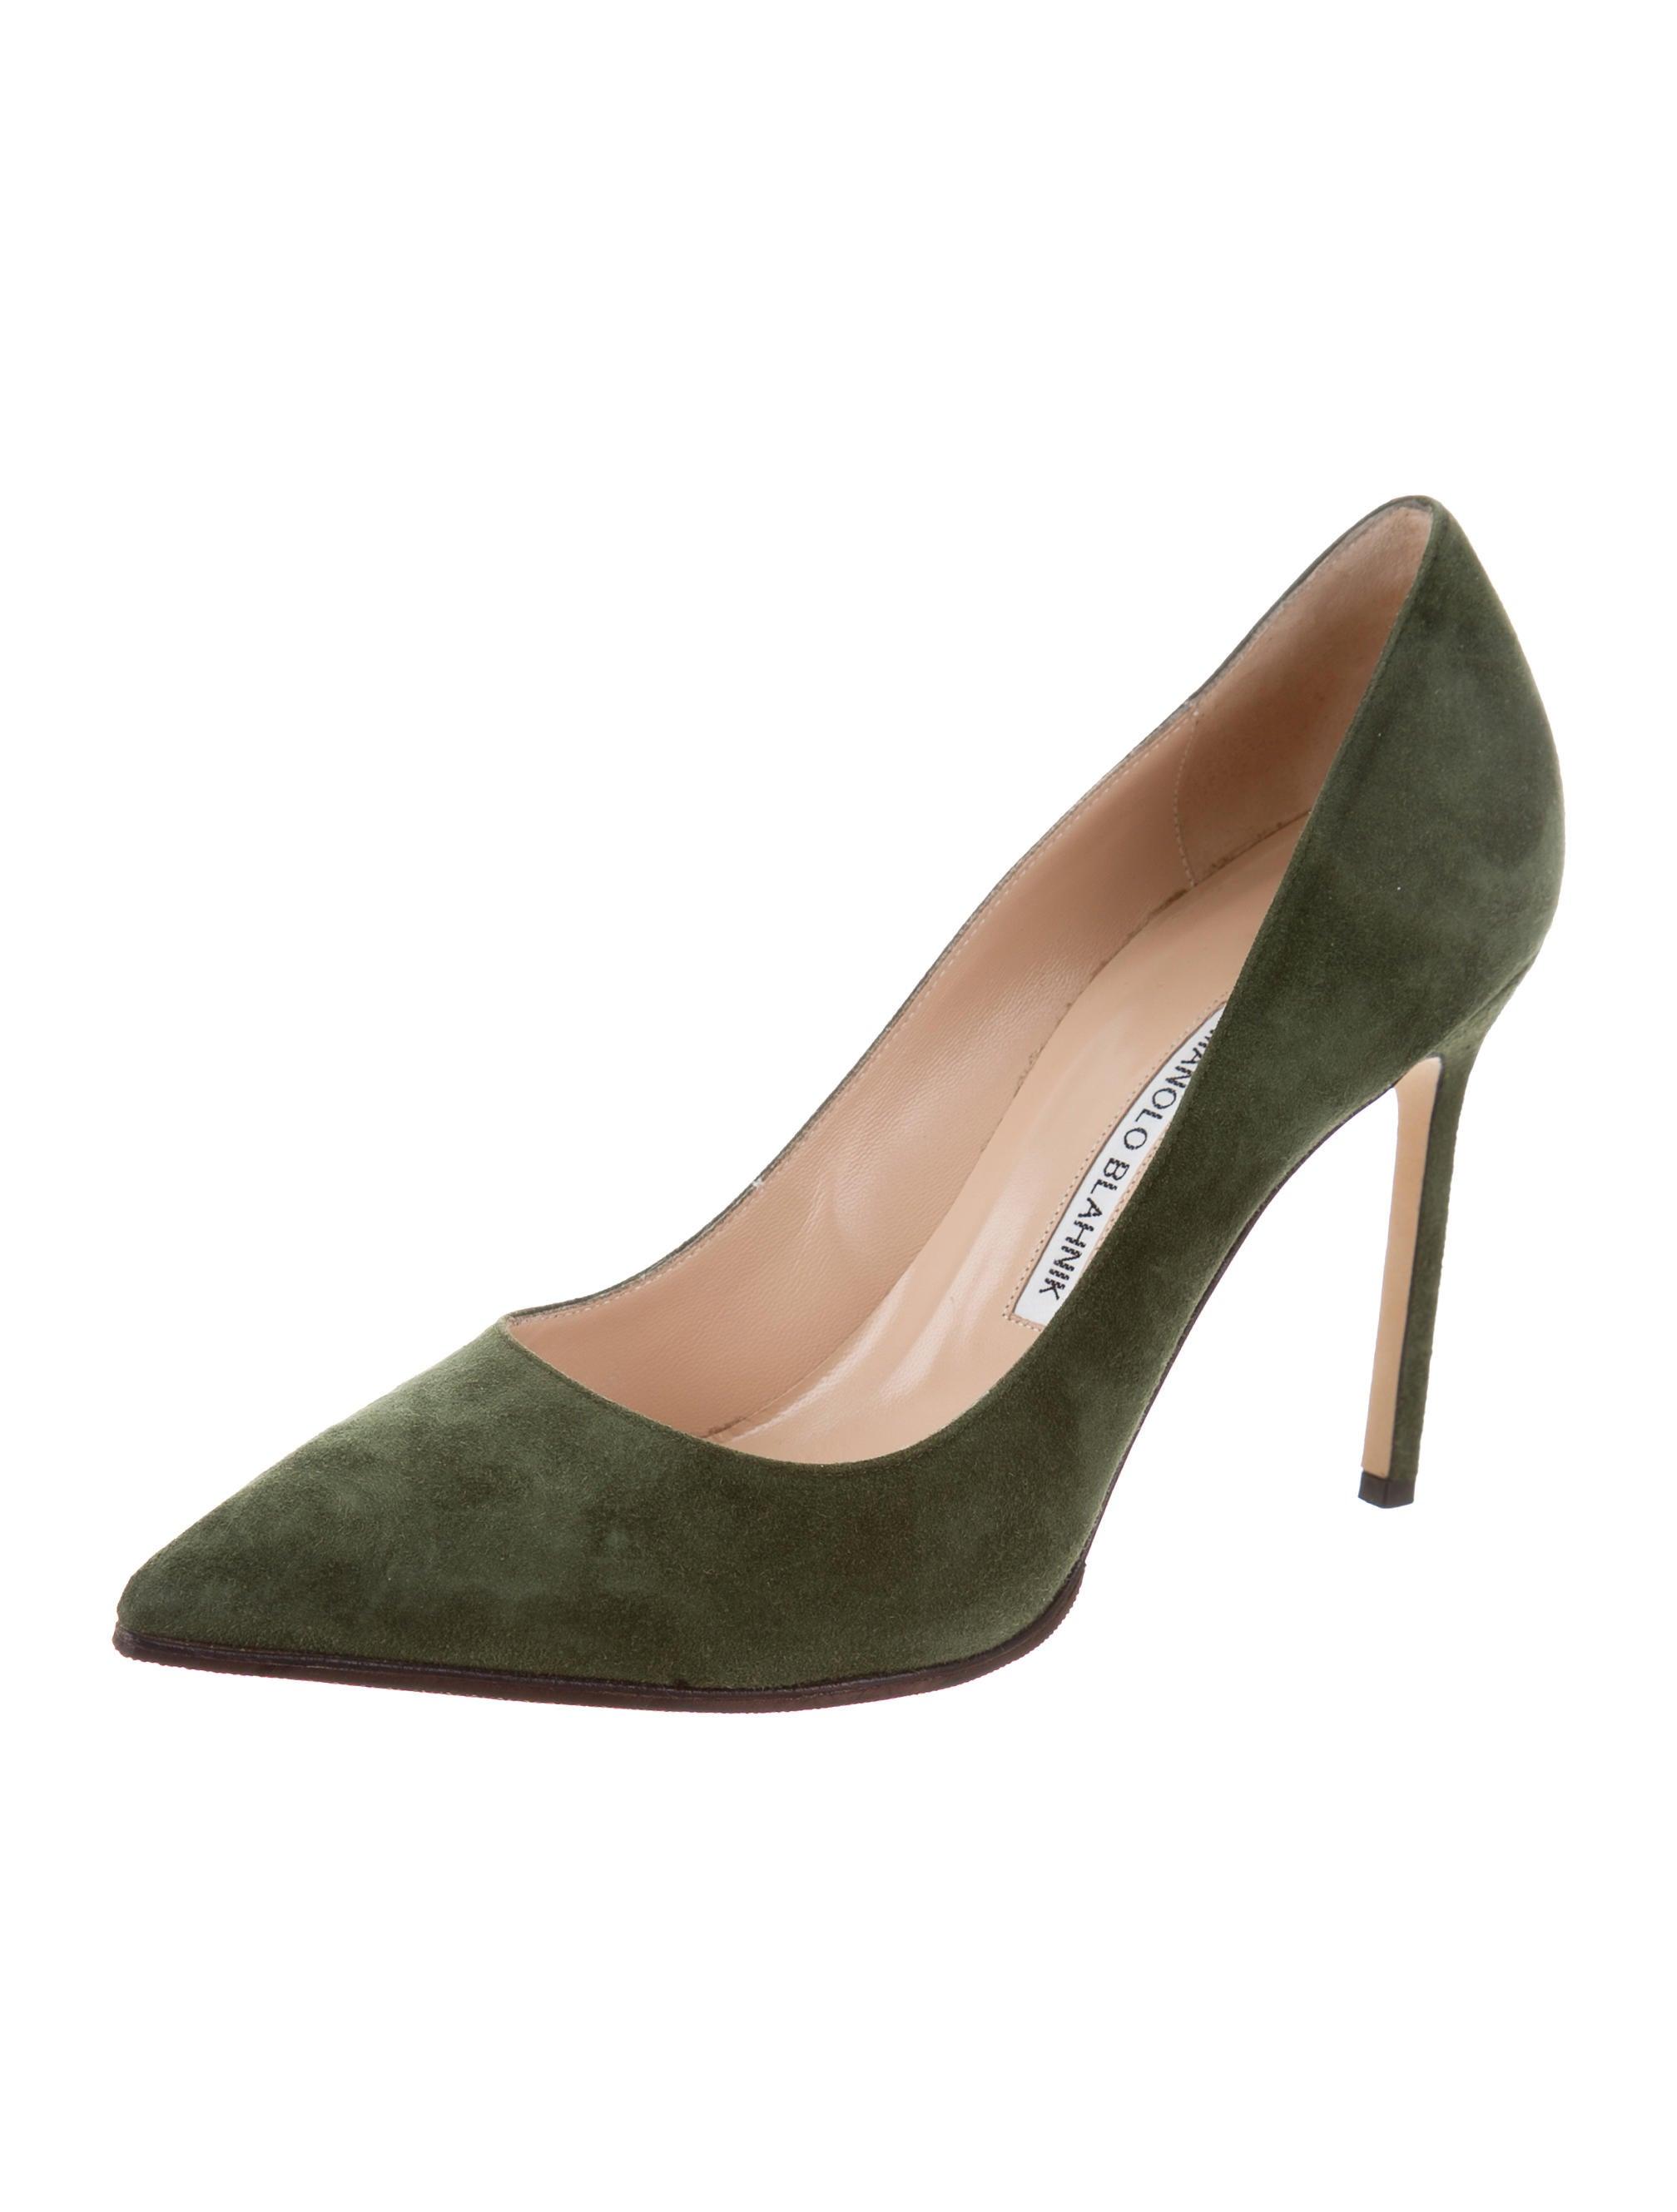 Manolo Blahnik Suede Bb Pumps Shoes Moo74507 The